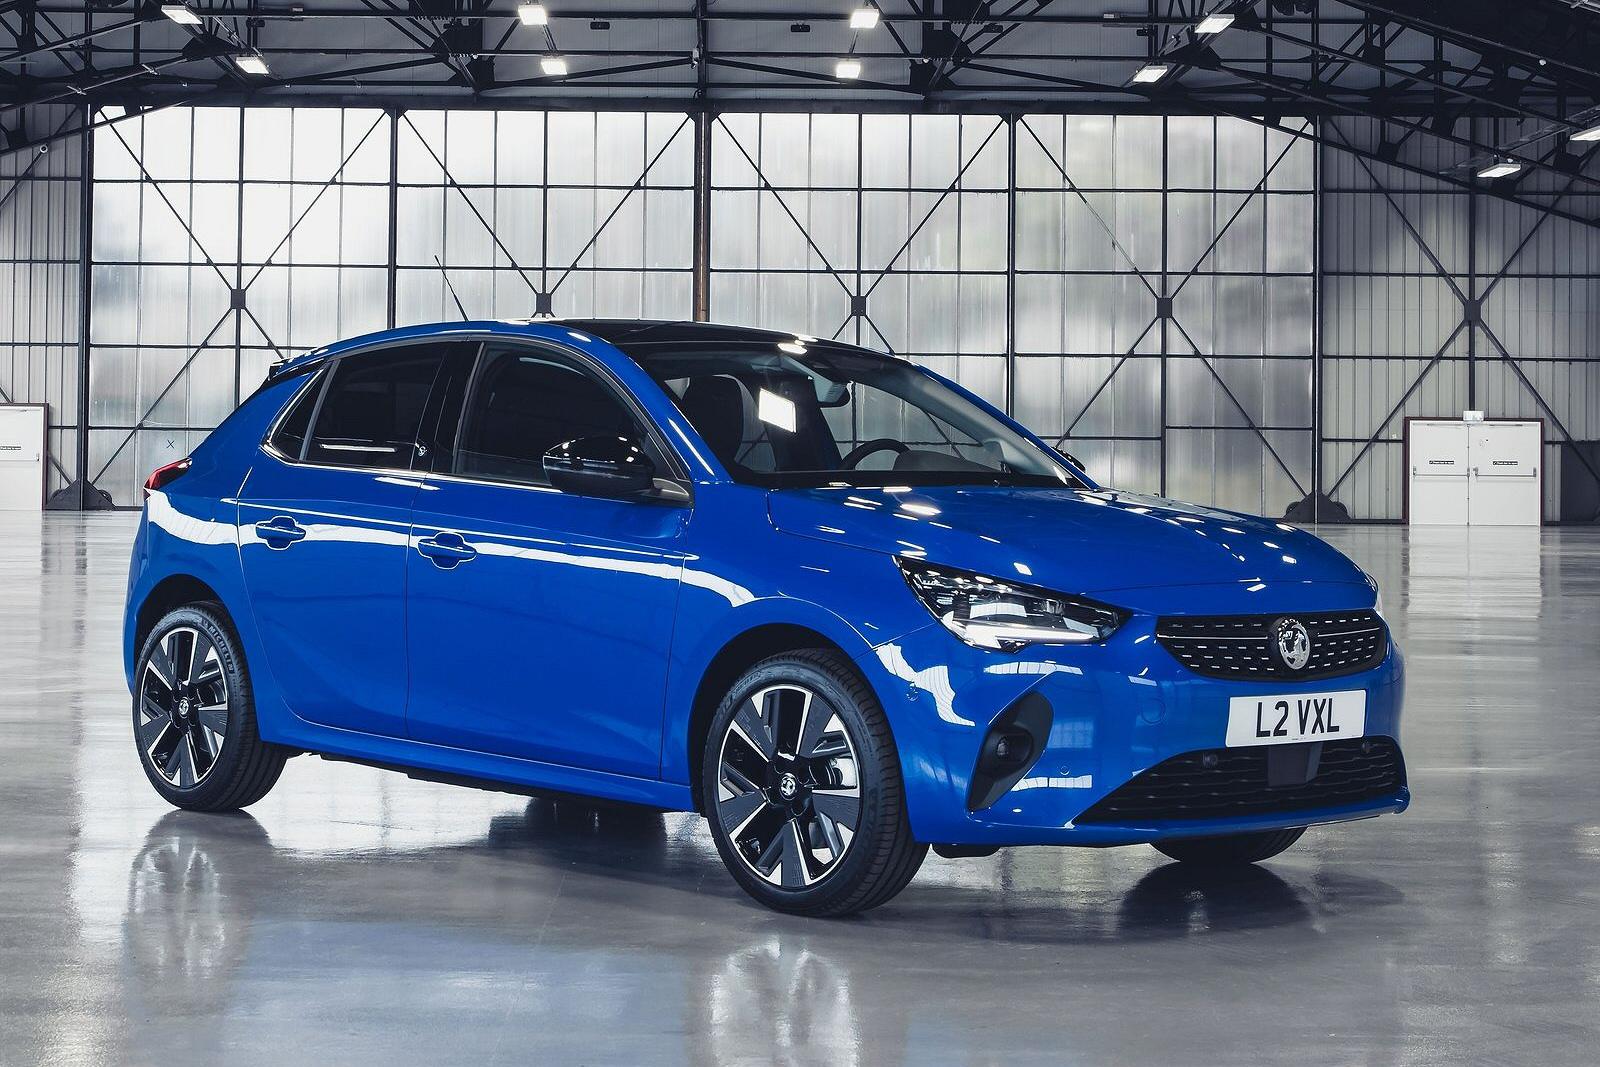 Vauxhall Corsa 1.2 Turbo SE Premium 5dr Auto